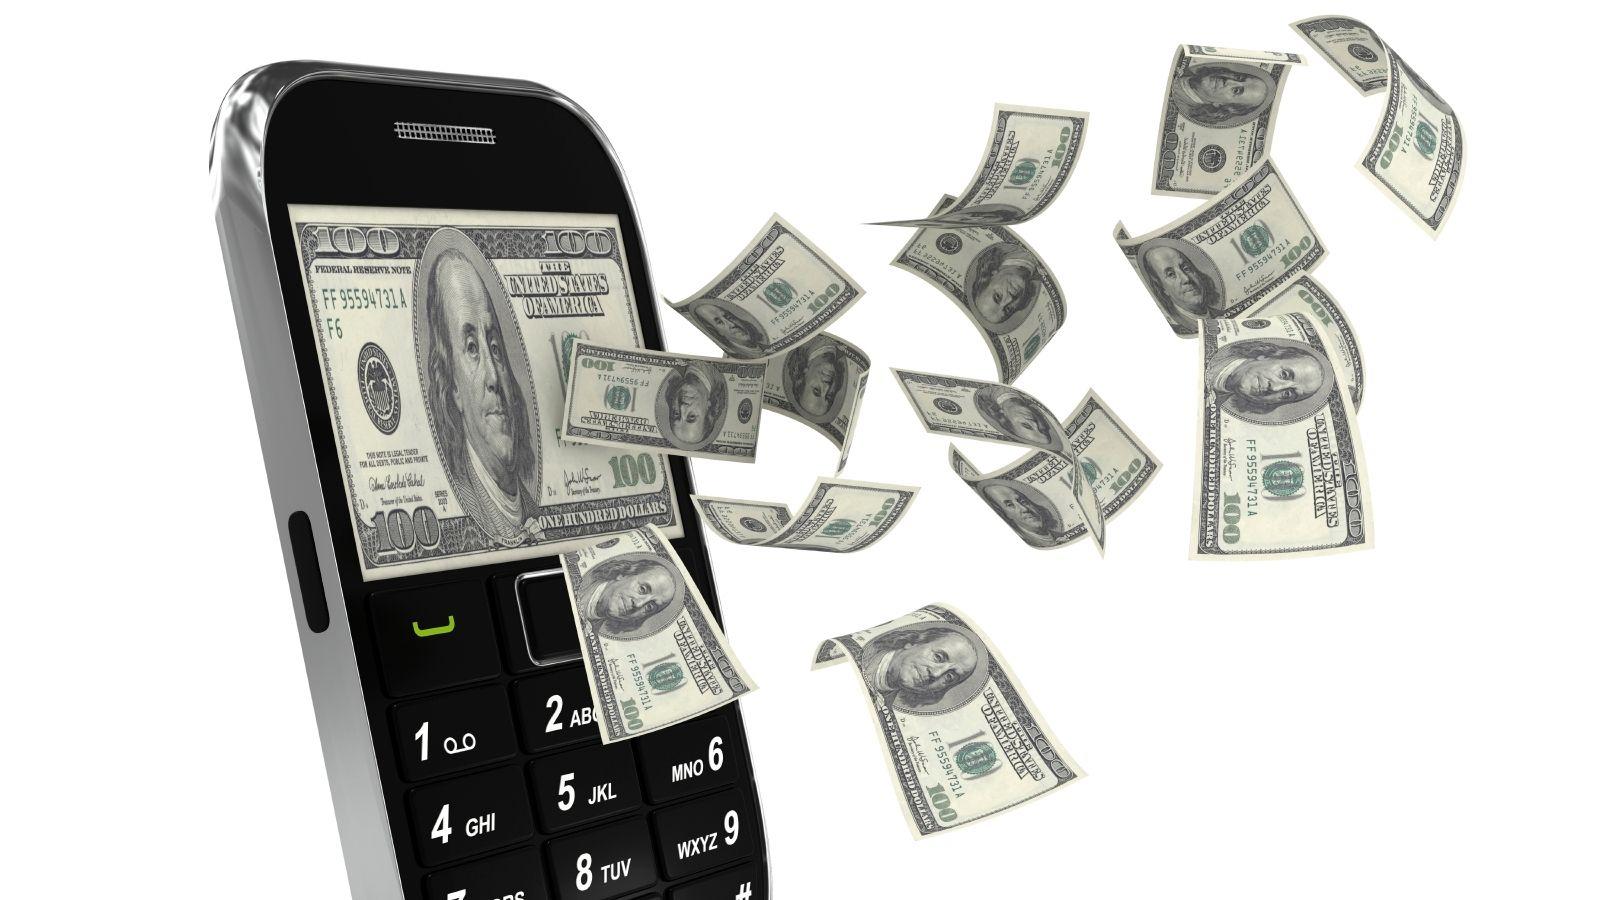 – Google tester mobilbetaling